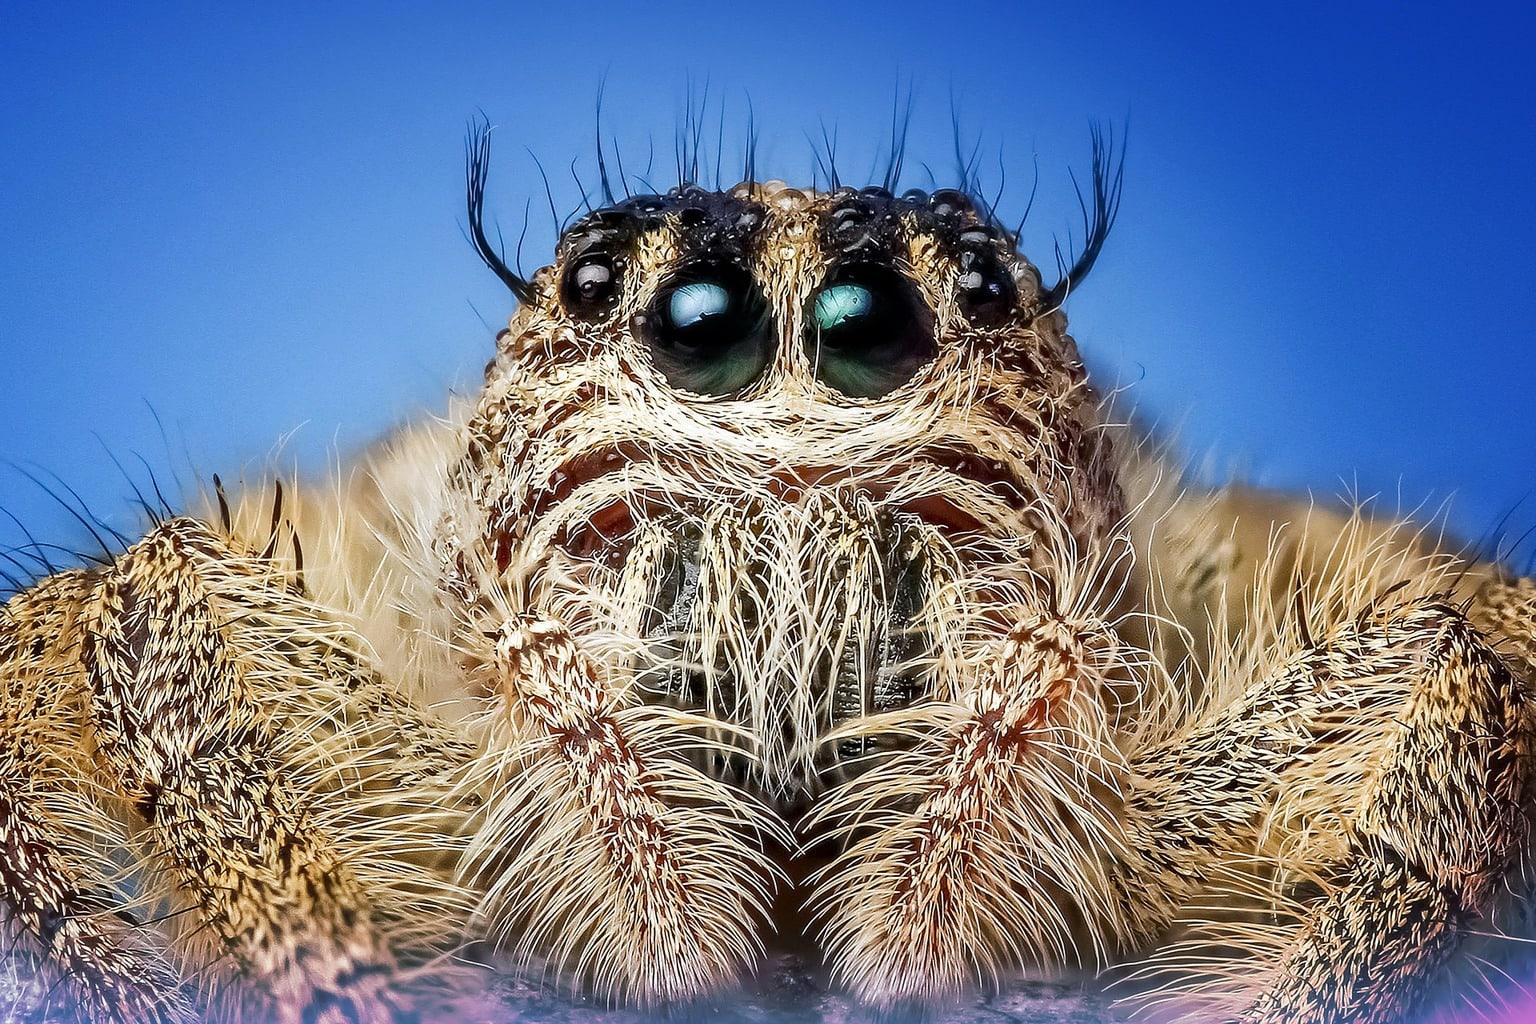 jumping-spider-1127626_1920